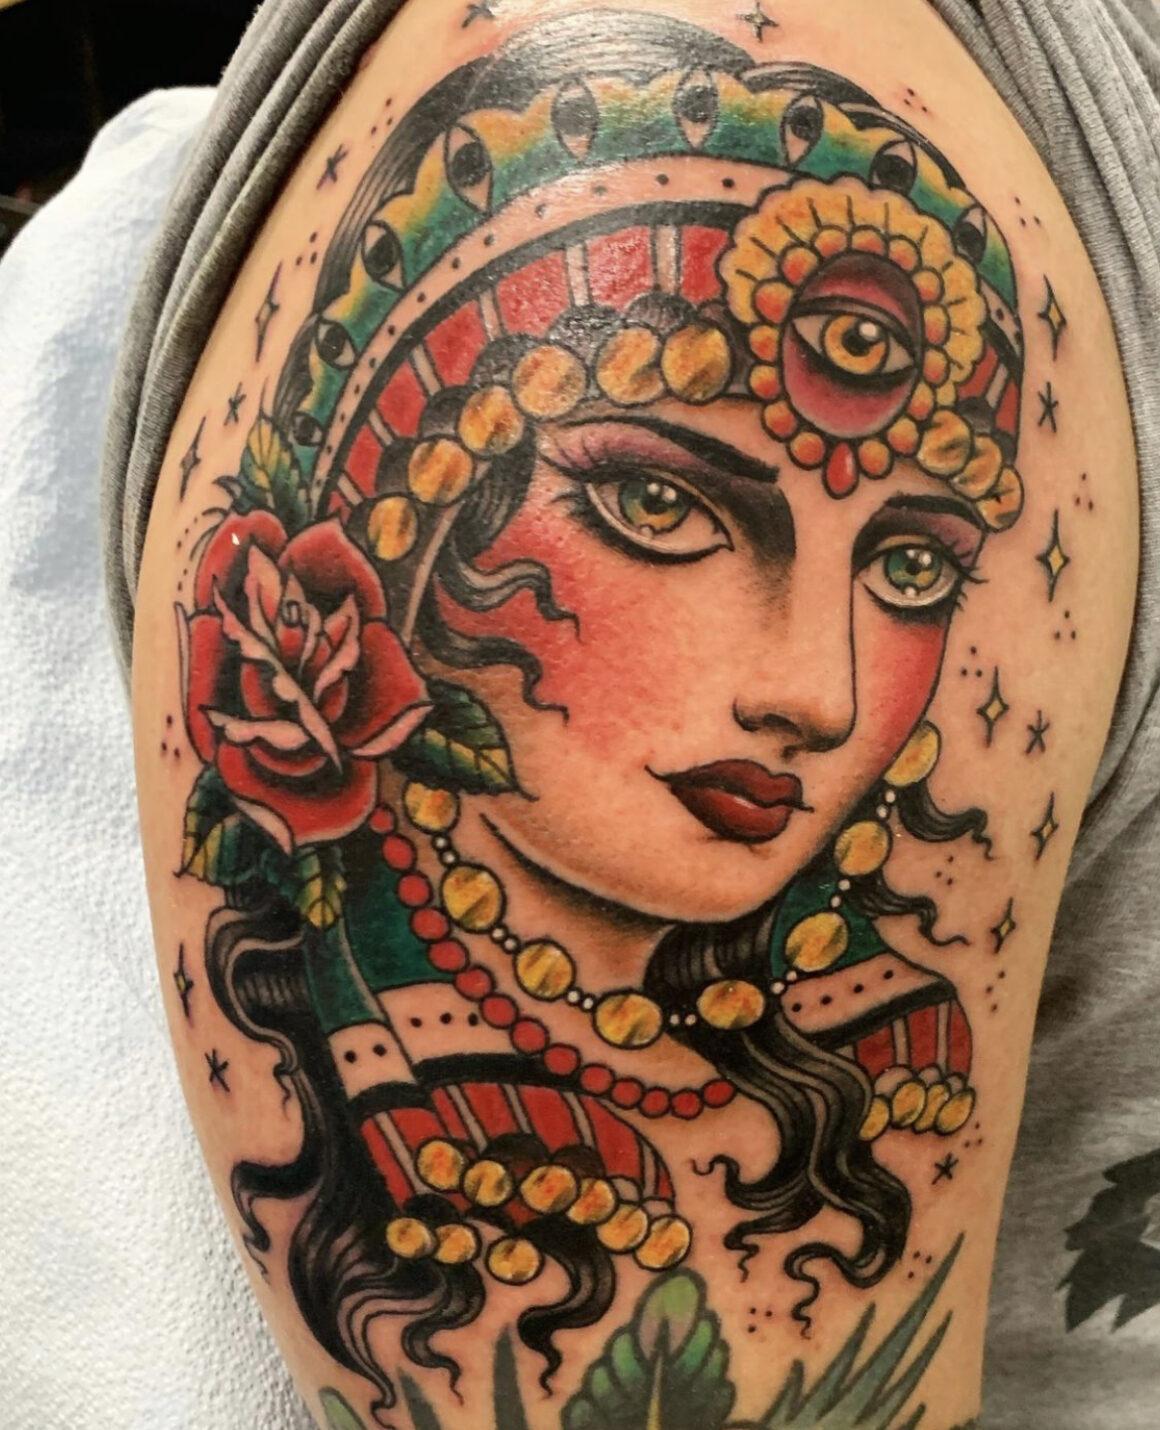 Mary Joy Scott, Raven Eye Tattoo, San Francisco, USA